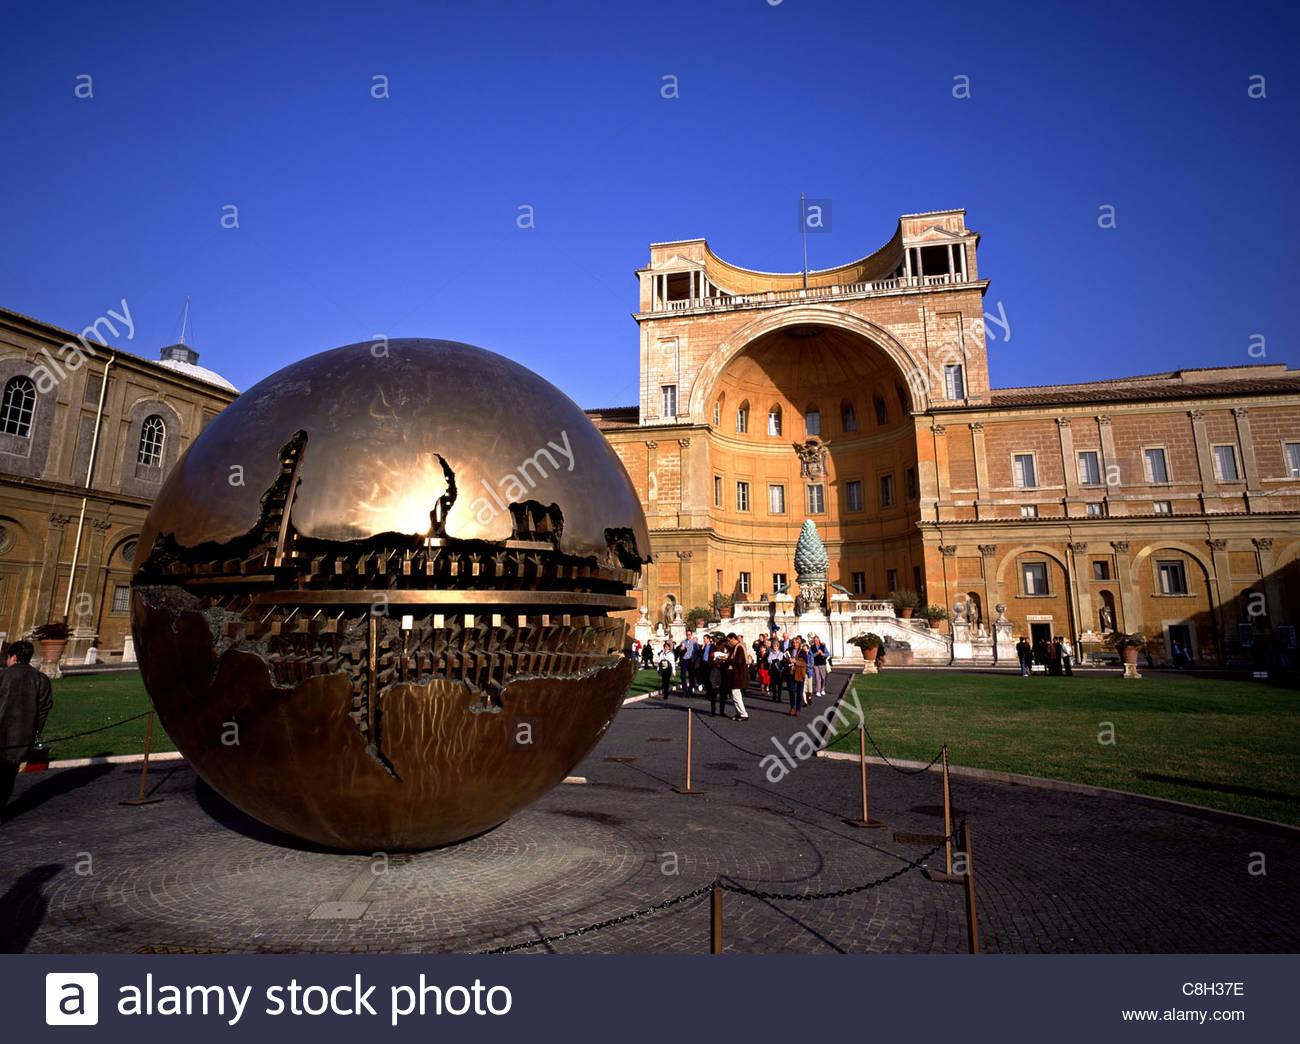 Arnaldo Pomodoros Kugel im Bereich Bildhauerei an der Vatikan. Stockbild